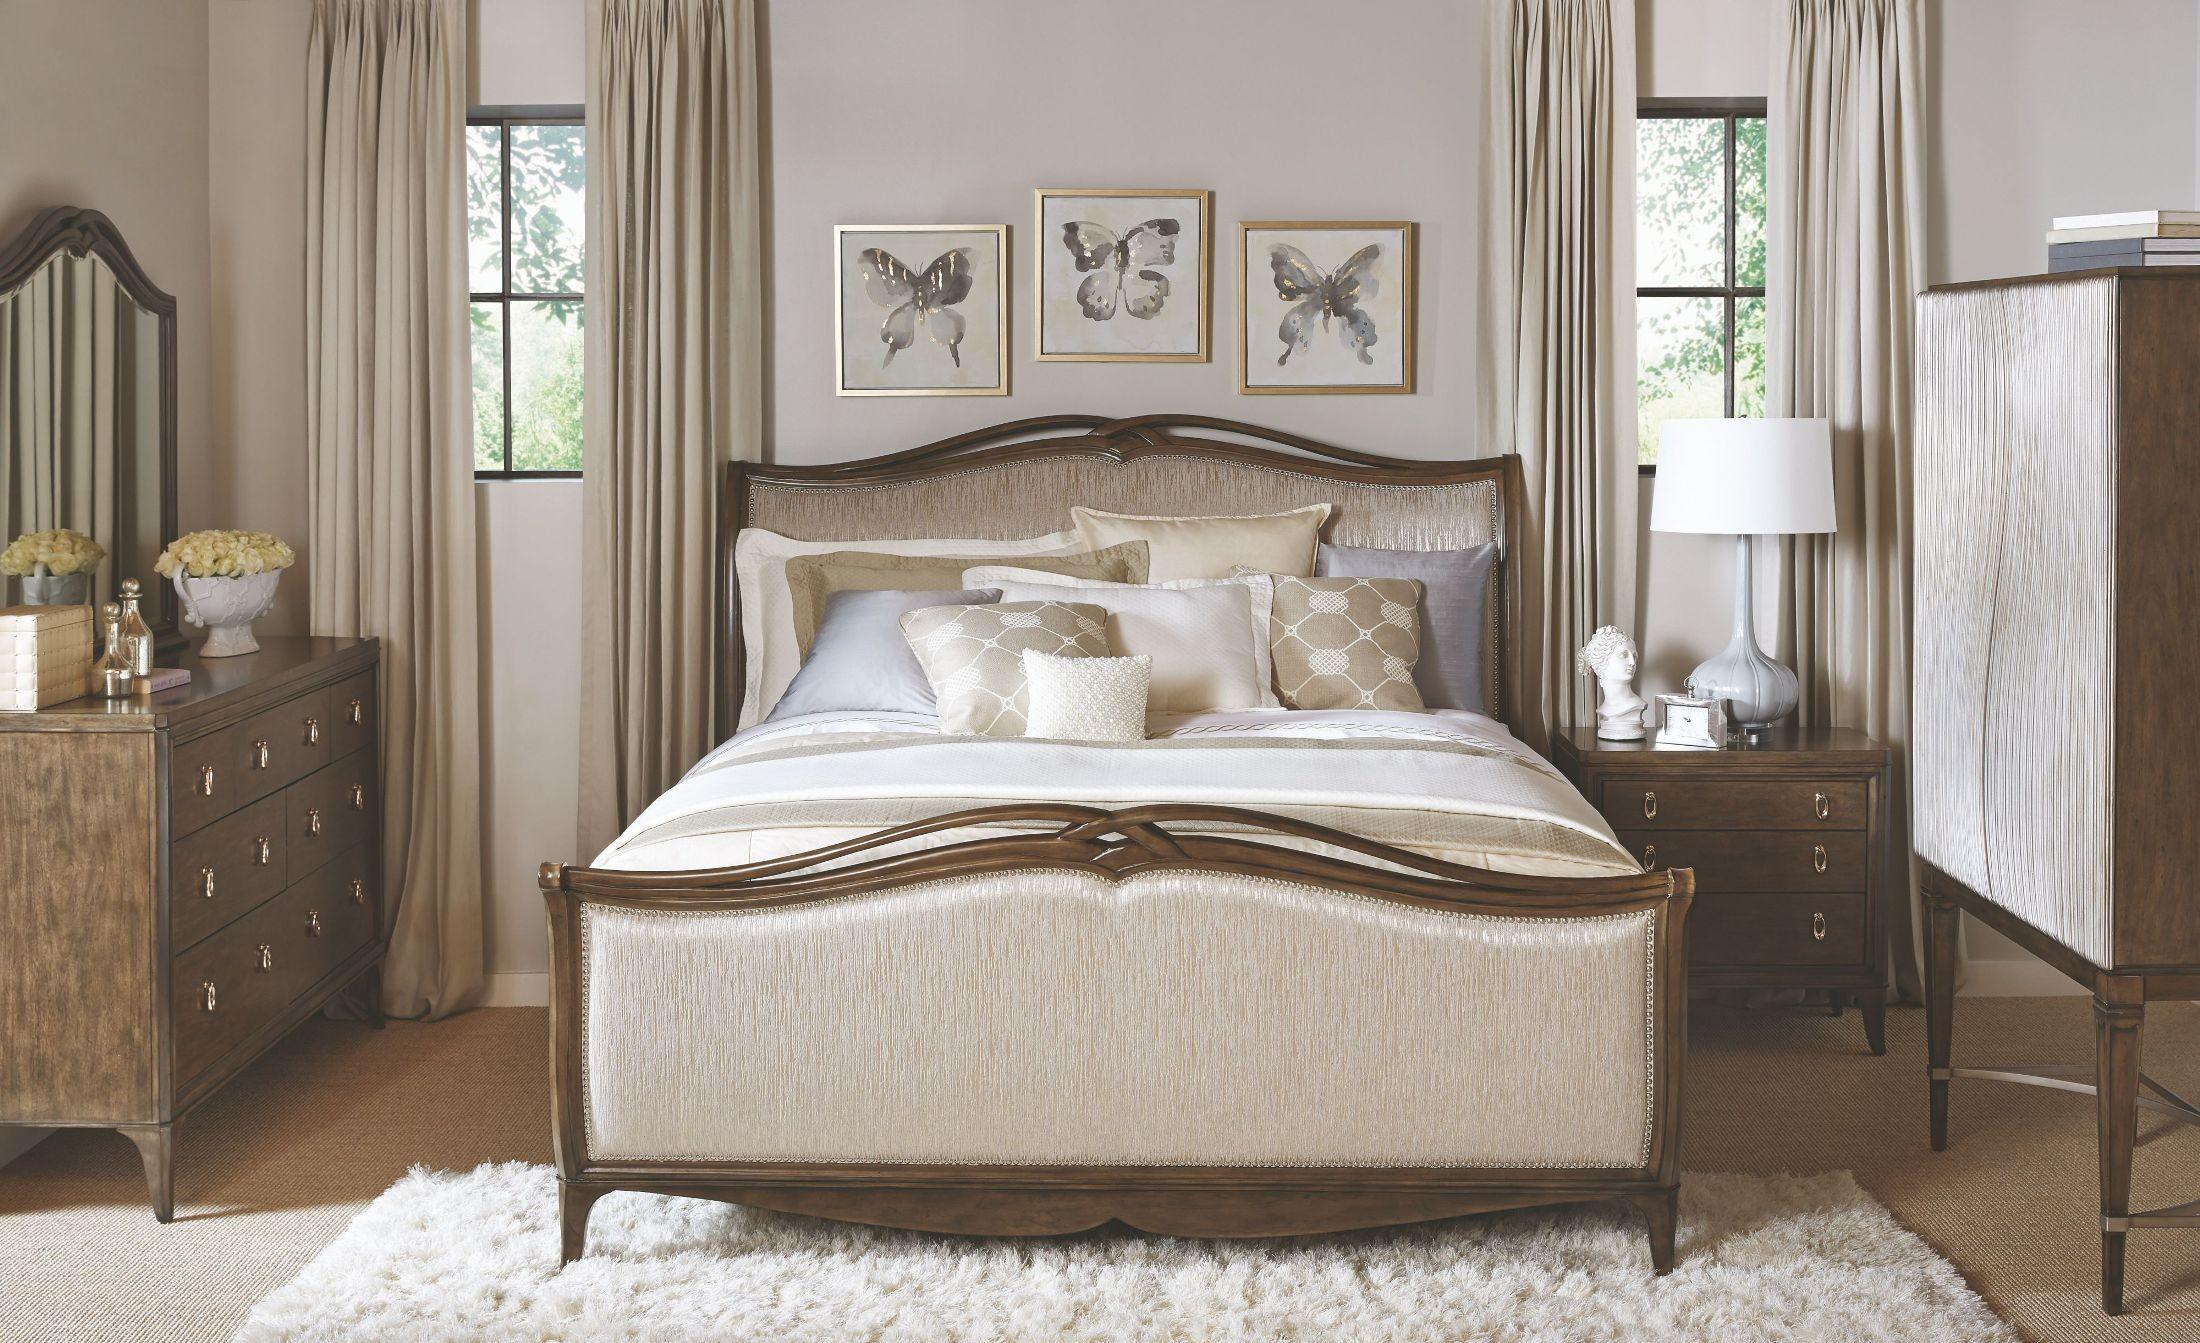 Cashmera rich truffle upholstered sleigh bedroom set 4860 270 271 460 broyhill for Upholstered sleigh bedroom set